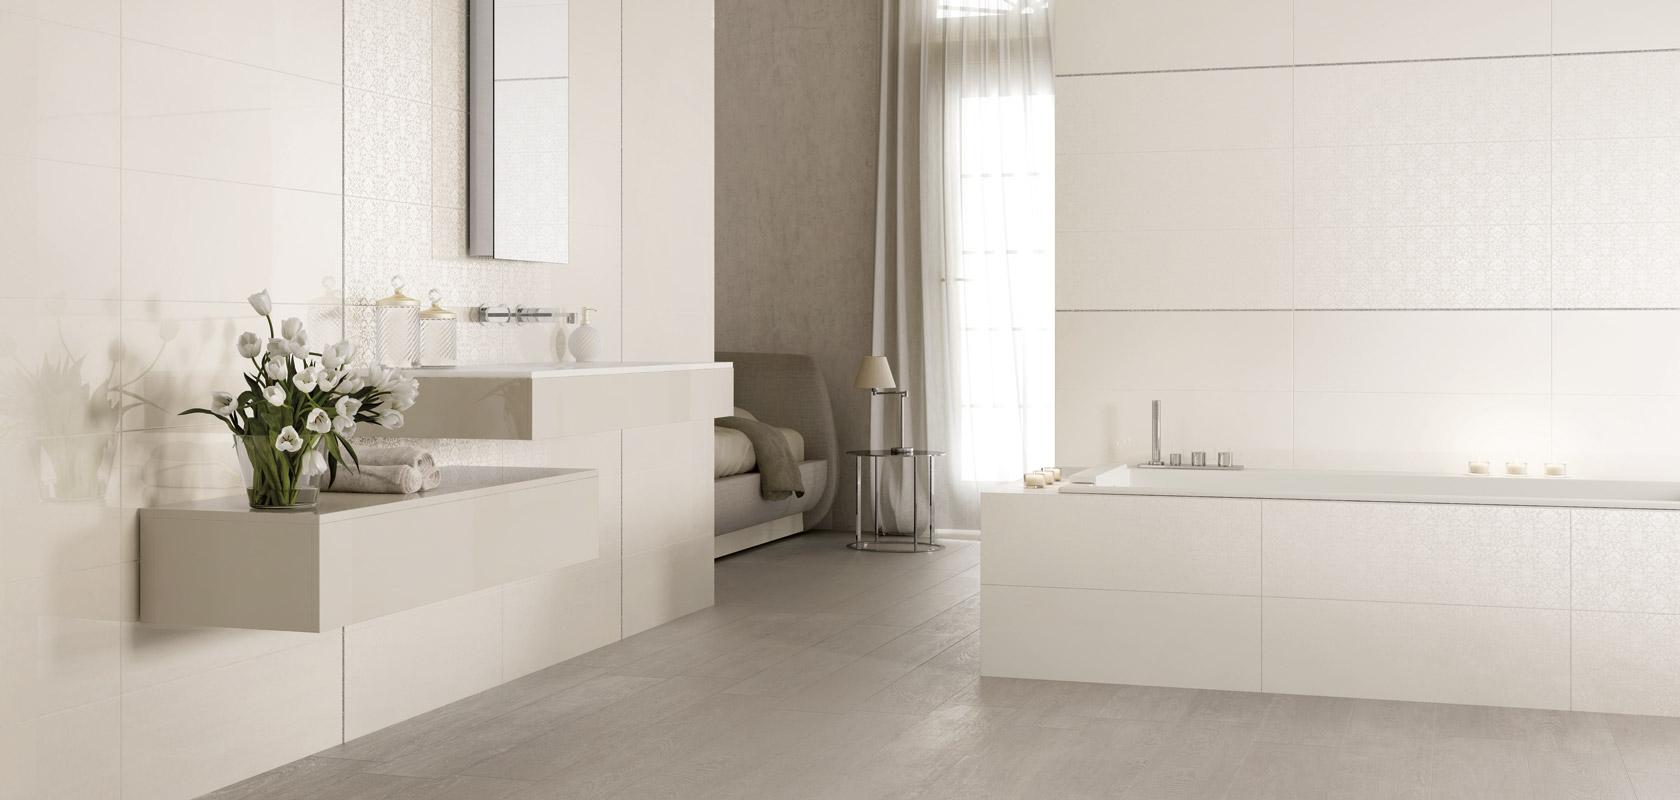 Obklady do koupelny melody m b keramika for Piastrelle bagno bianche lucide